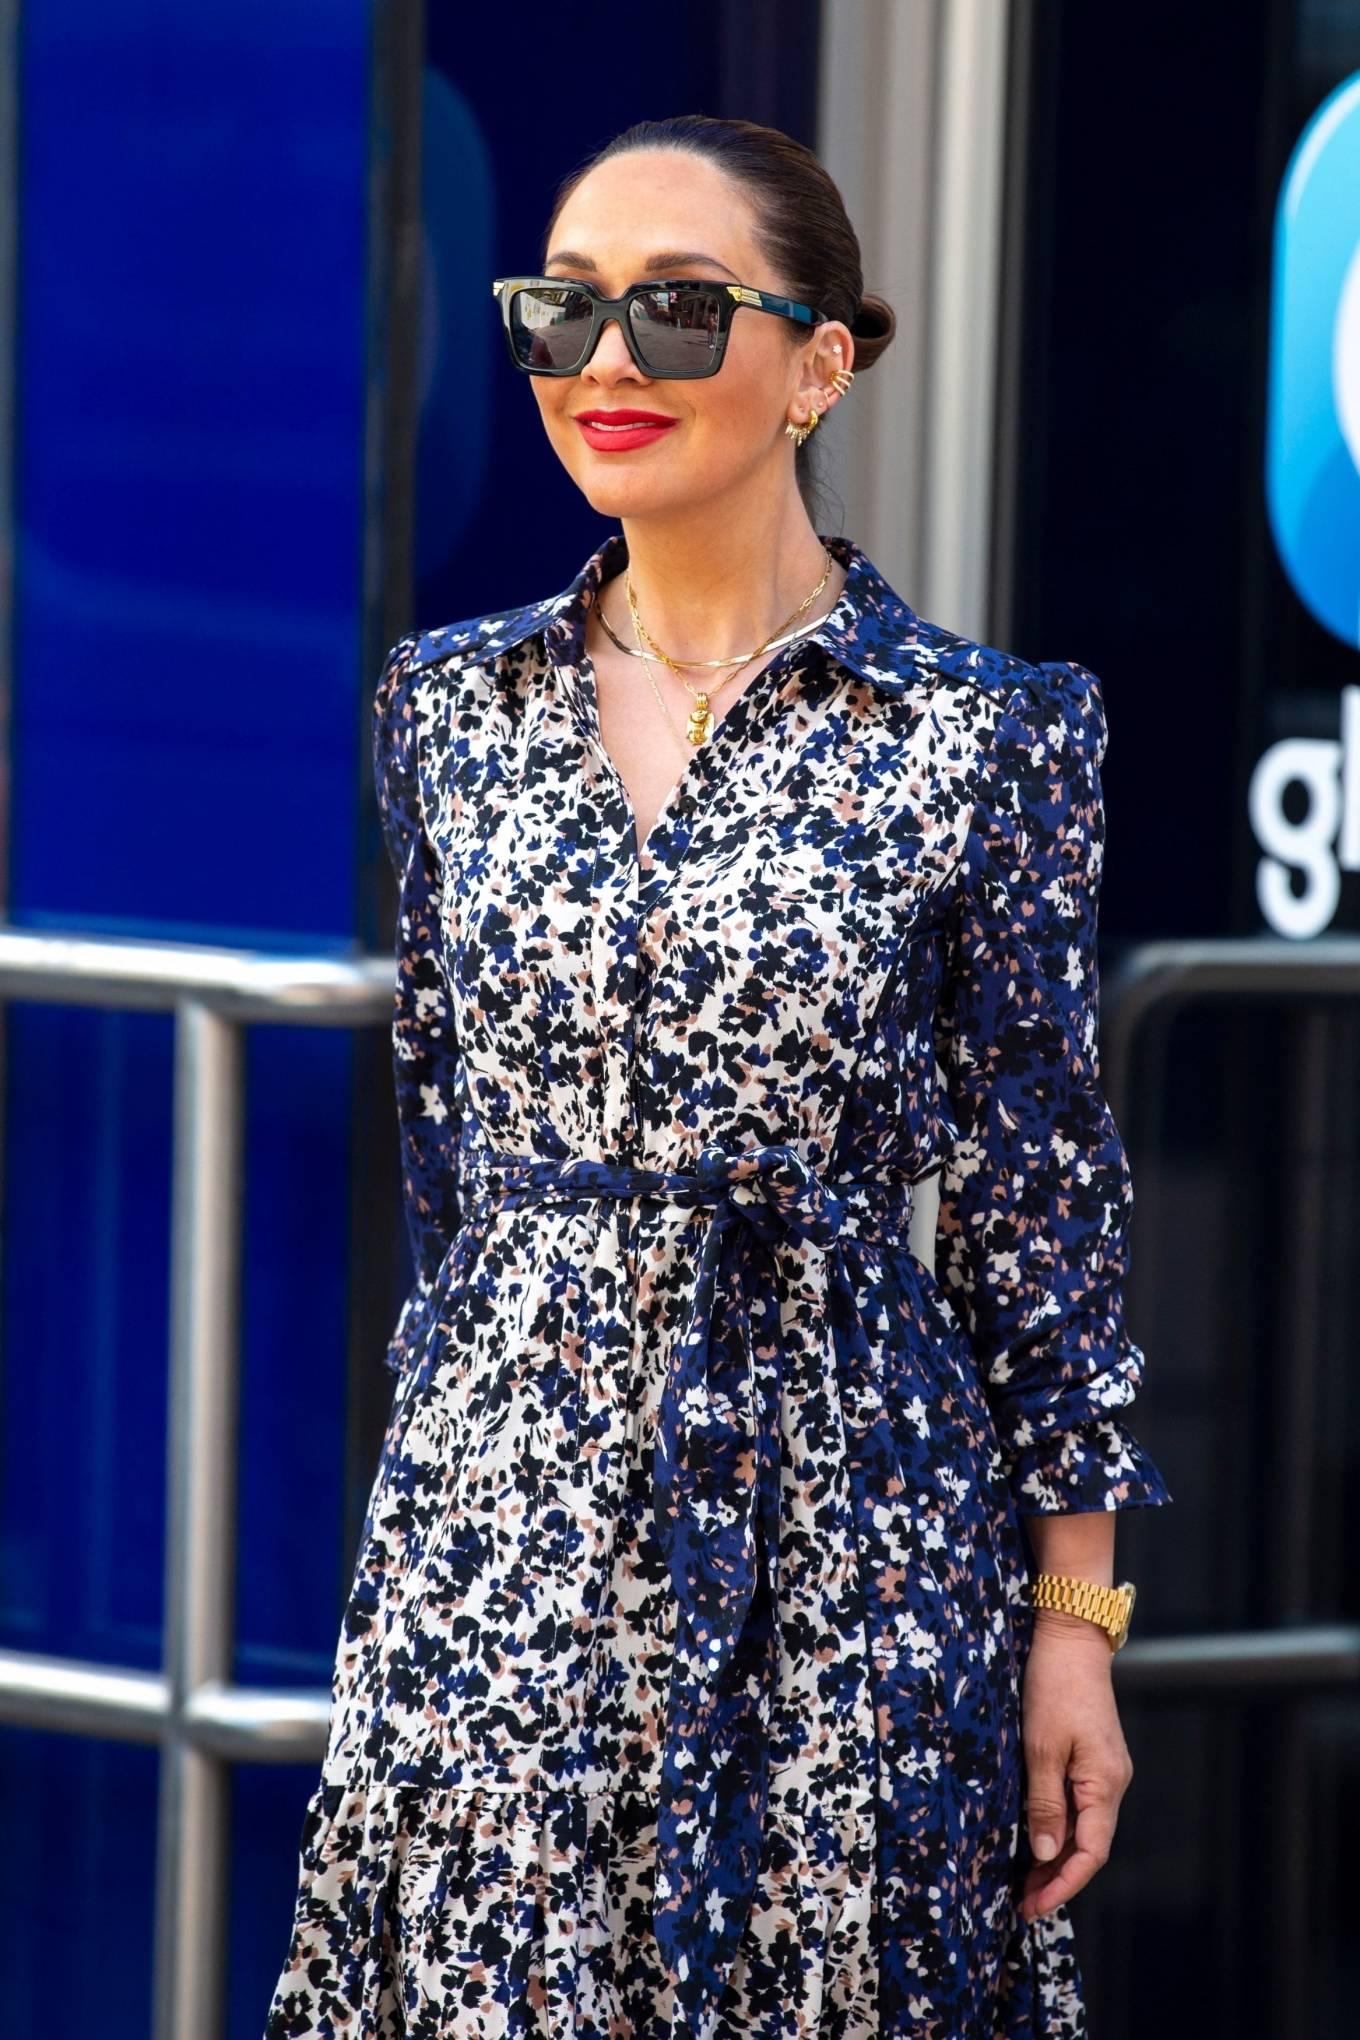 Myleene Klass 2021 : Myleene Klass – In a long summer dress arriving at the Global studios -15